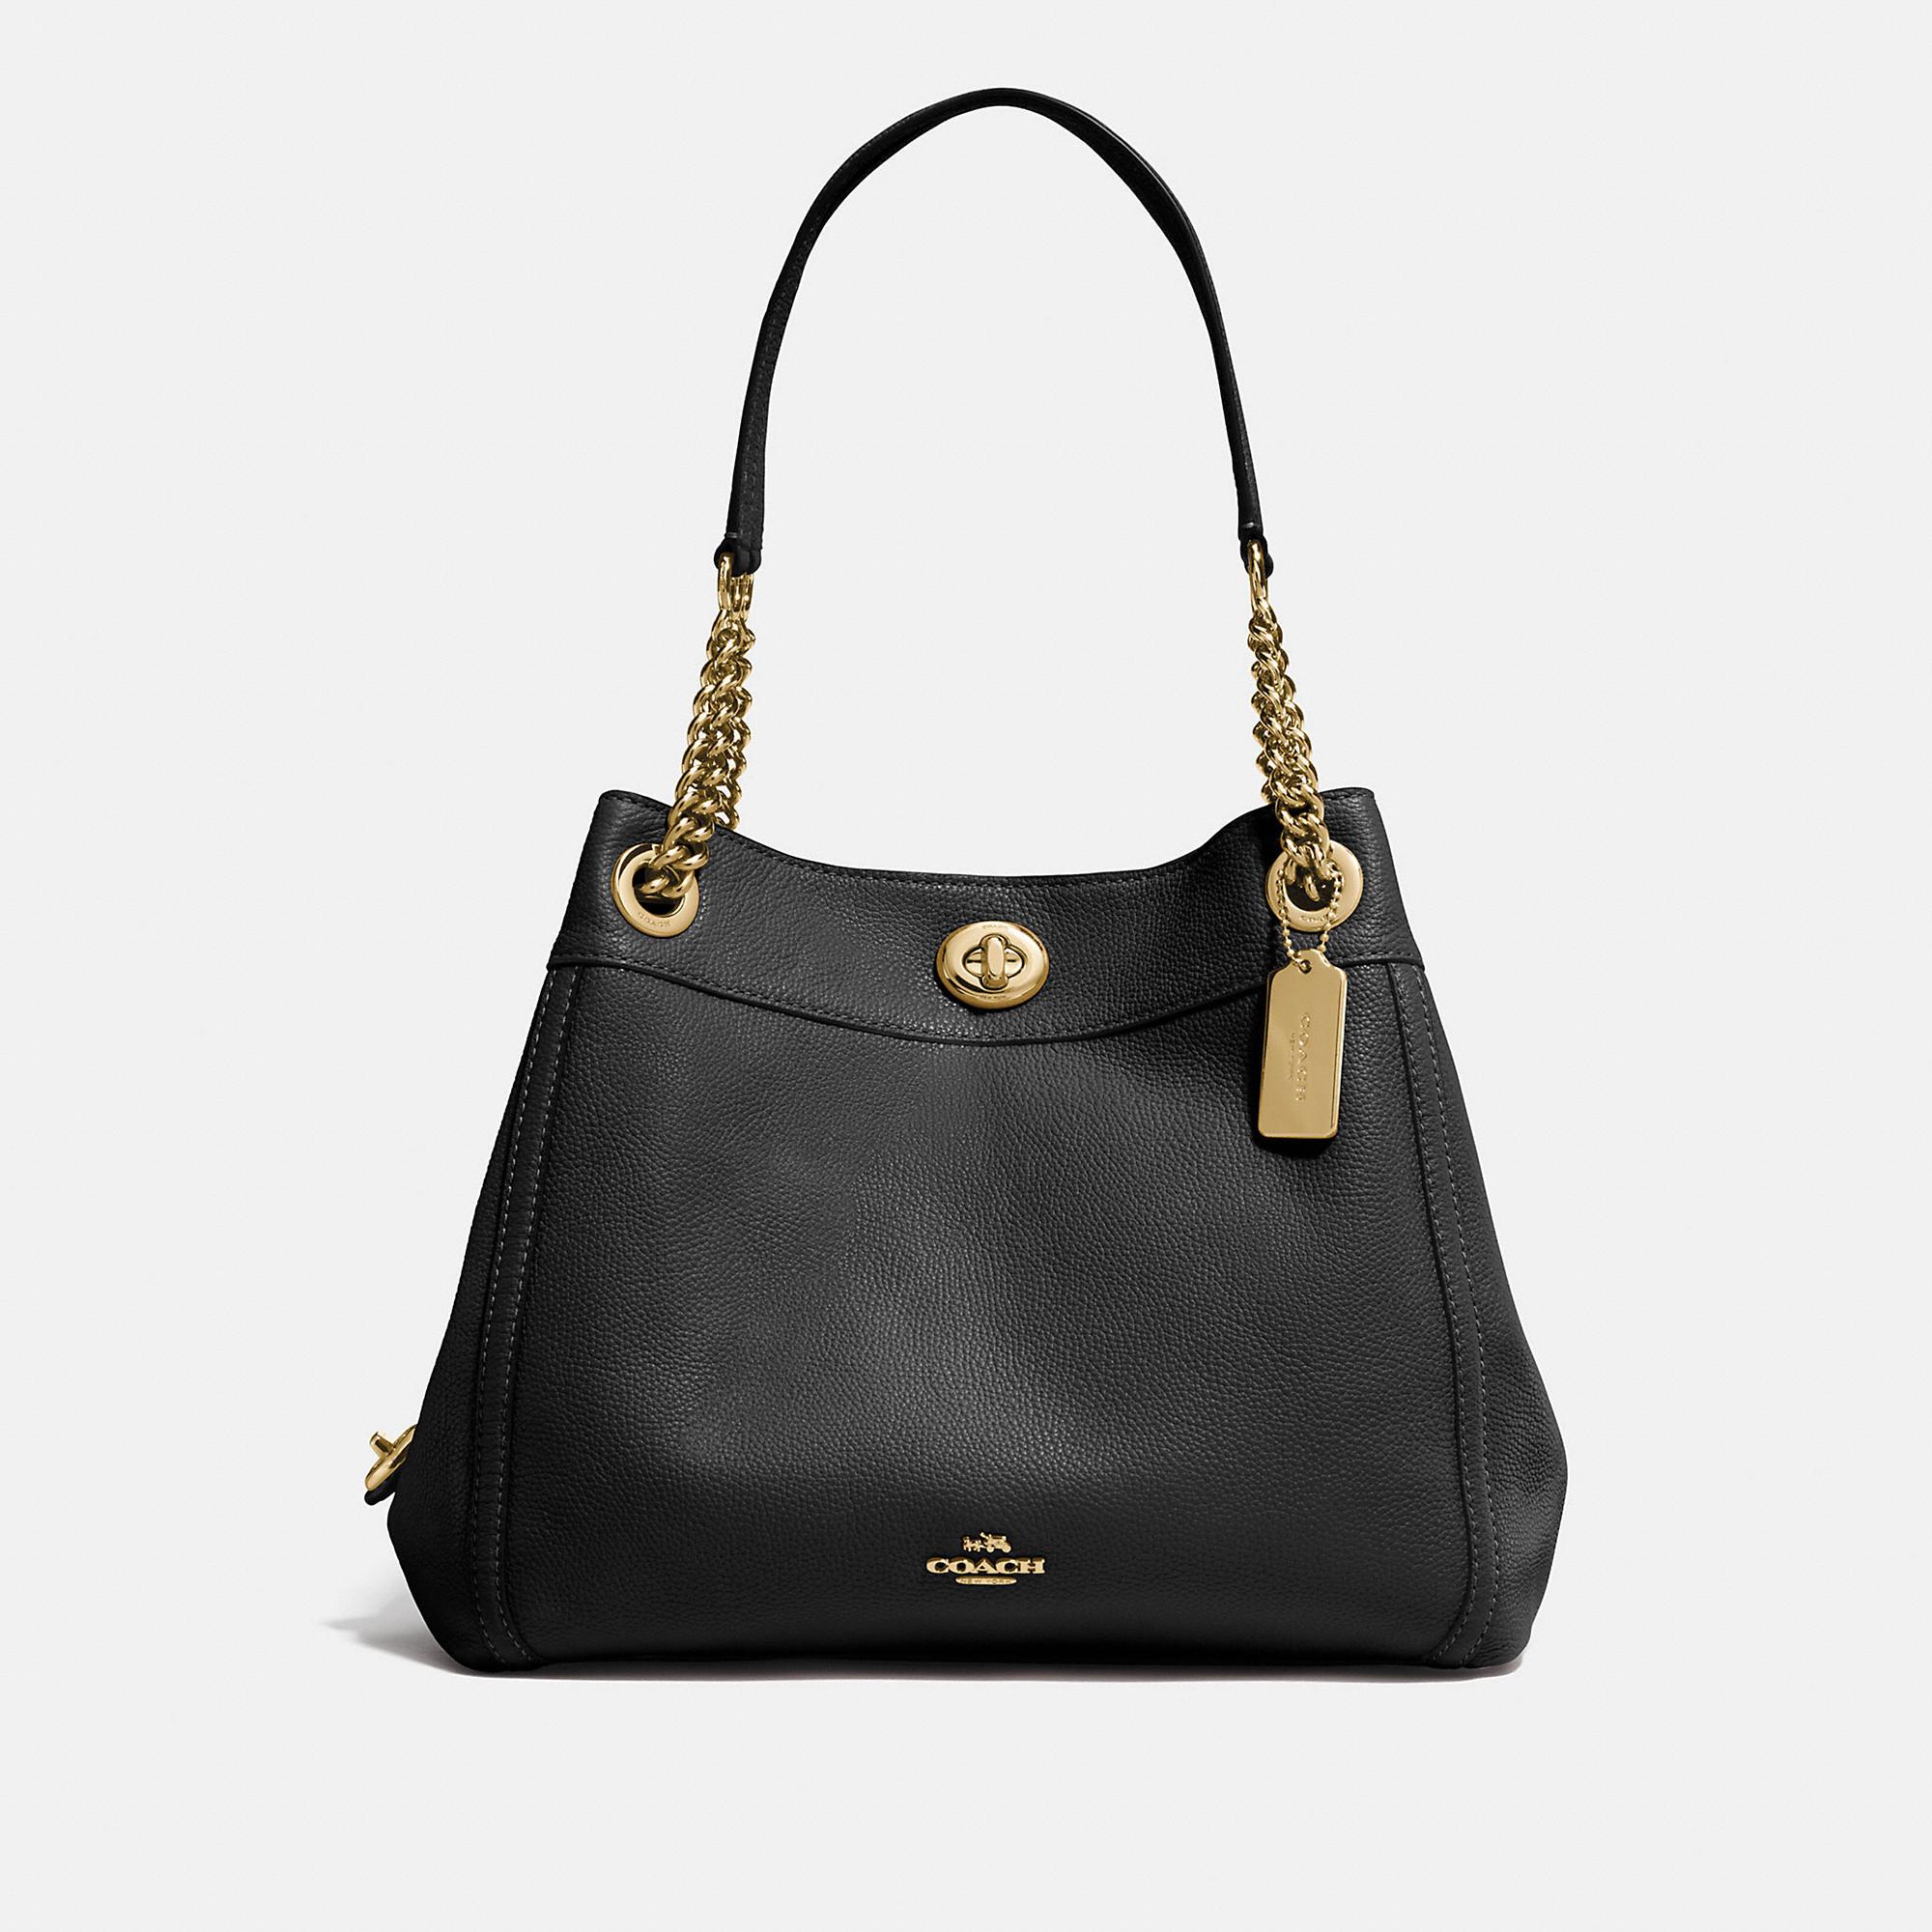 Coach Turnlock Edie Shoulder Bag In Polished Pebble Leather